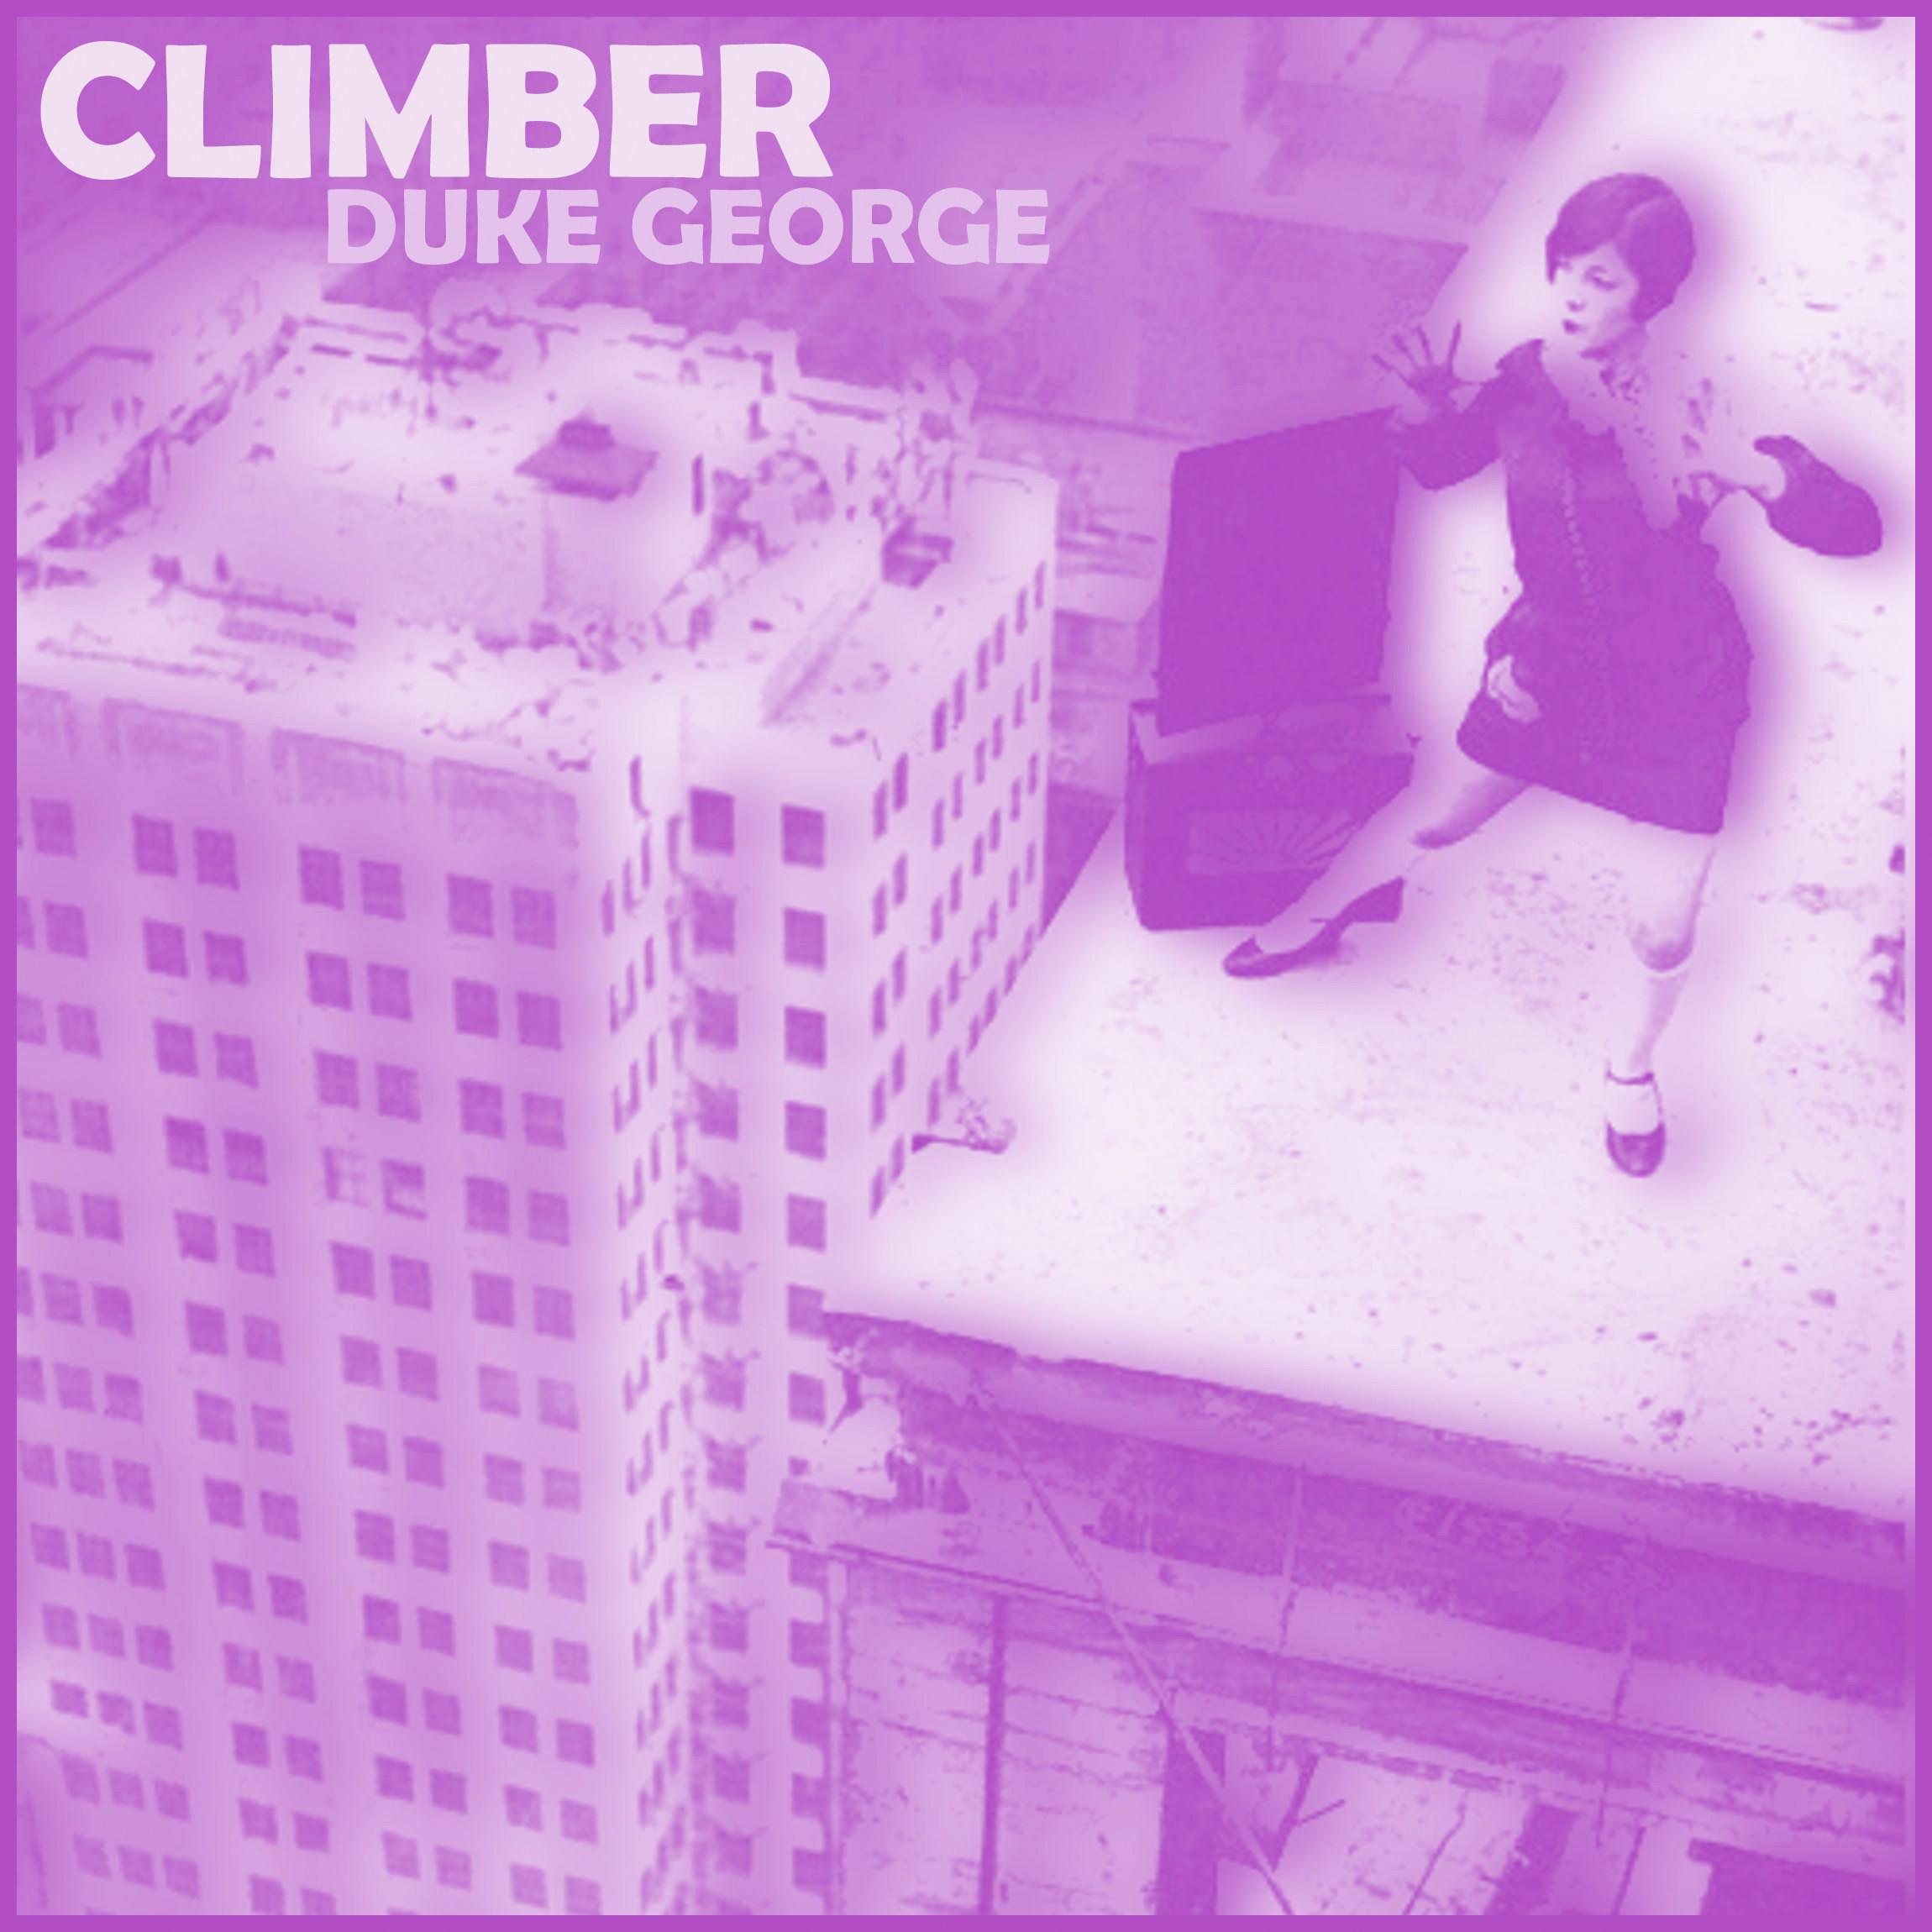 Climber_Duke George_Album Cover Final V2.jpg